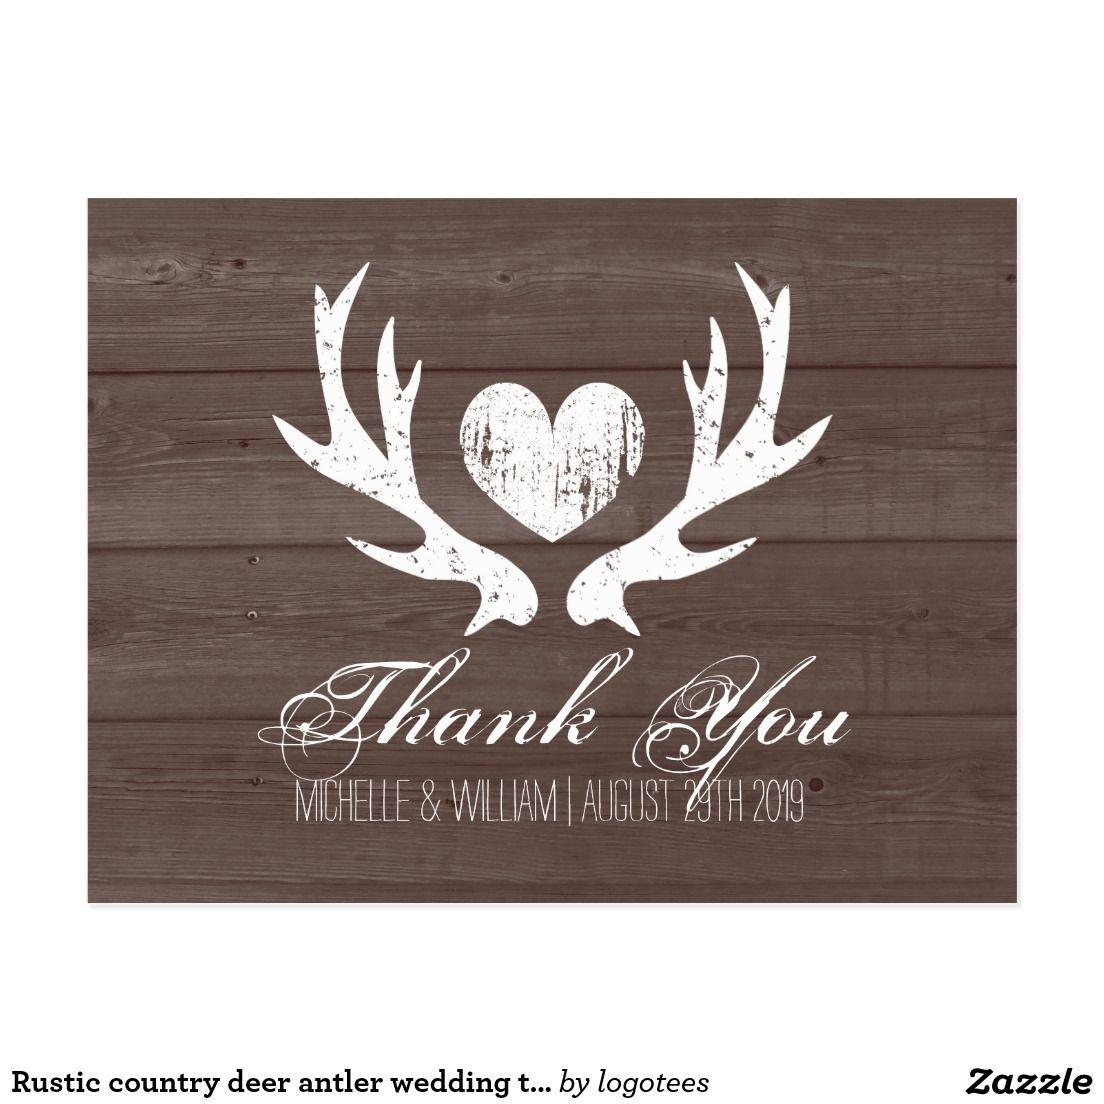 Rustic Country Deer Antler Wedding Thank You Cards Wedding Thank